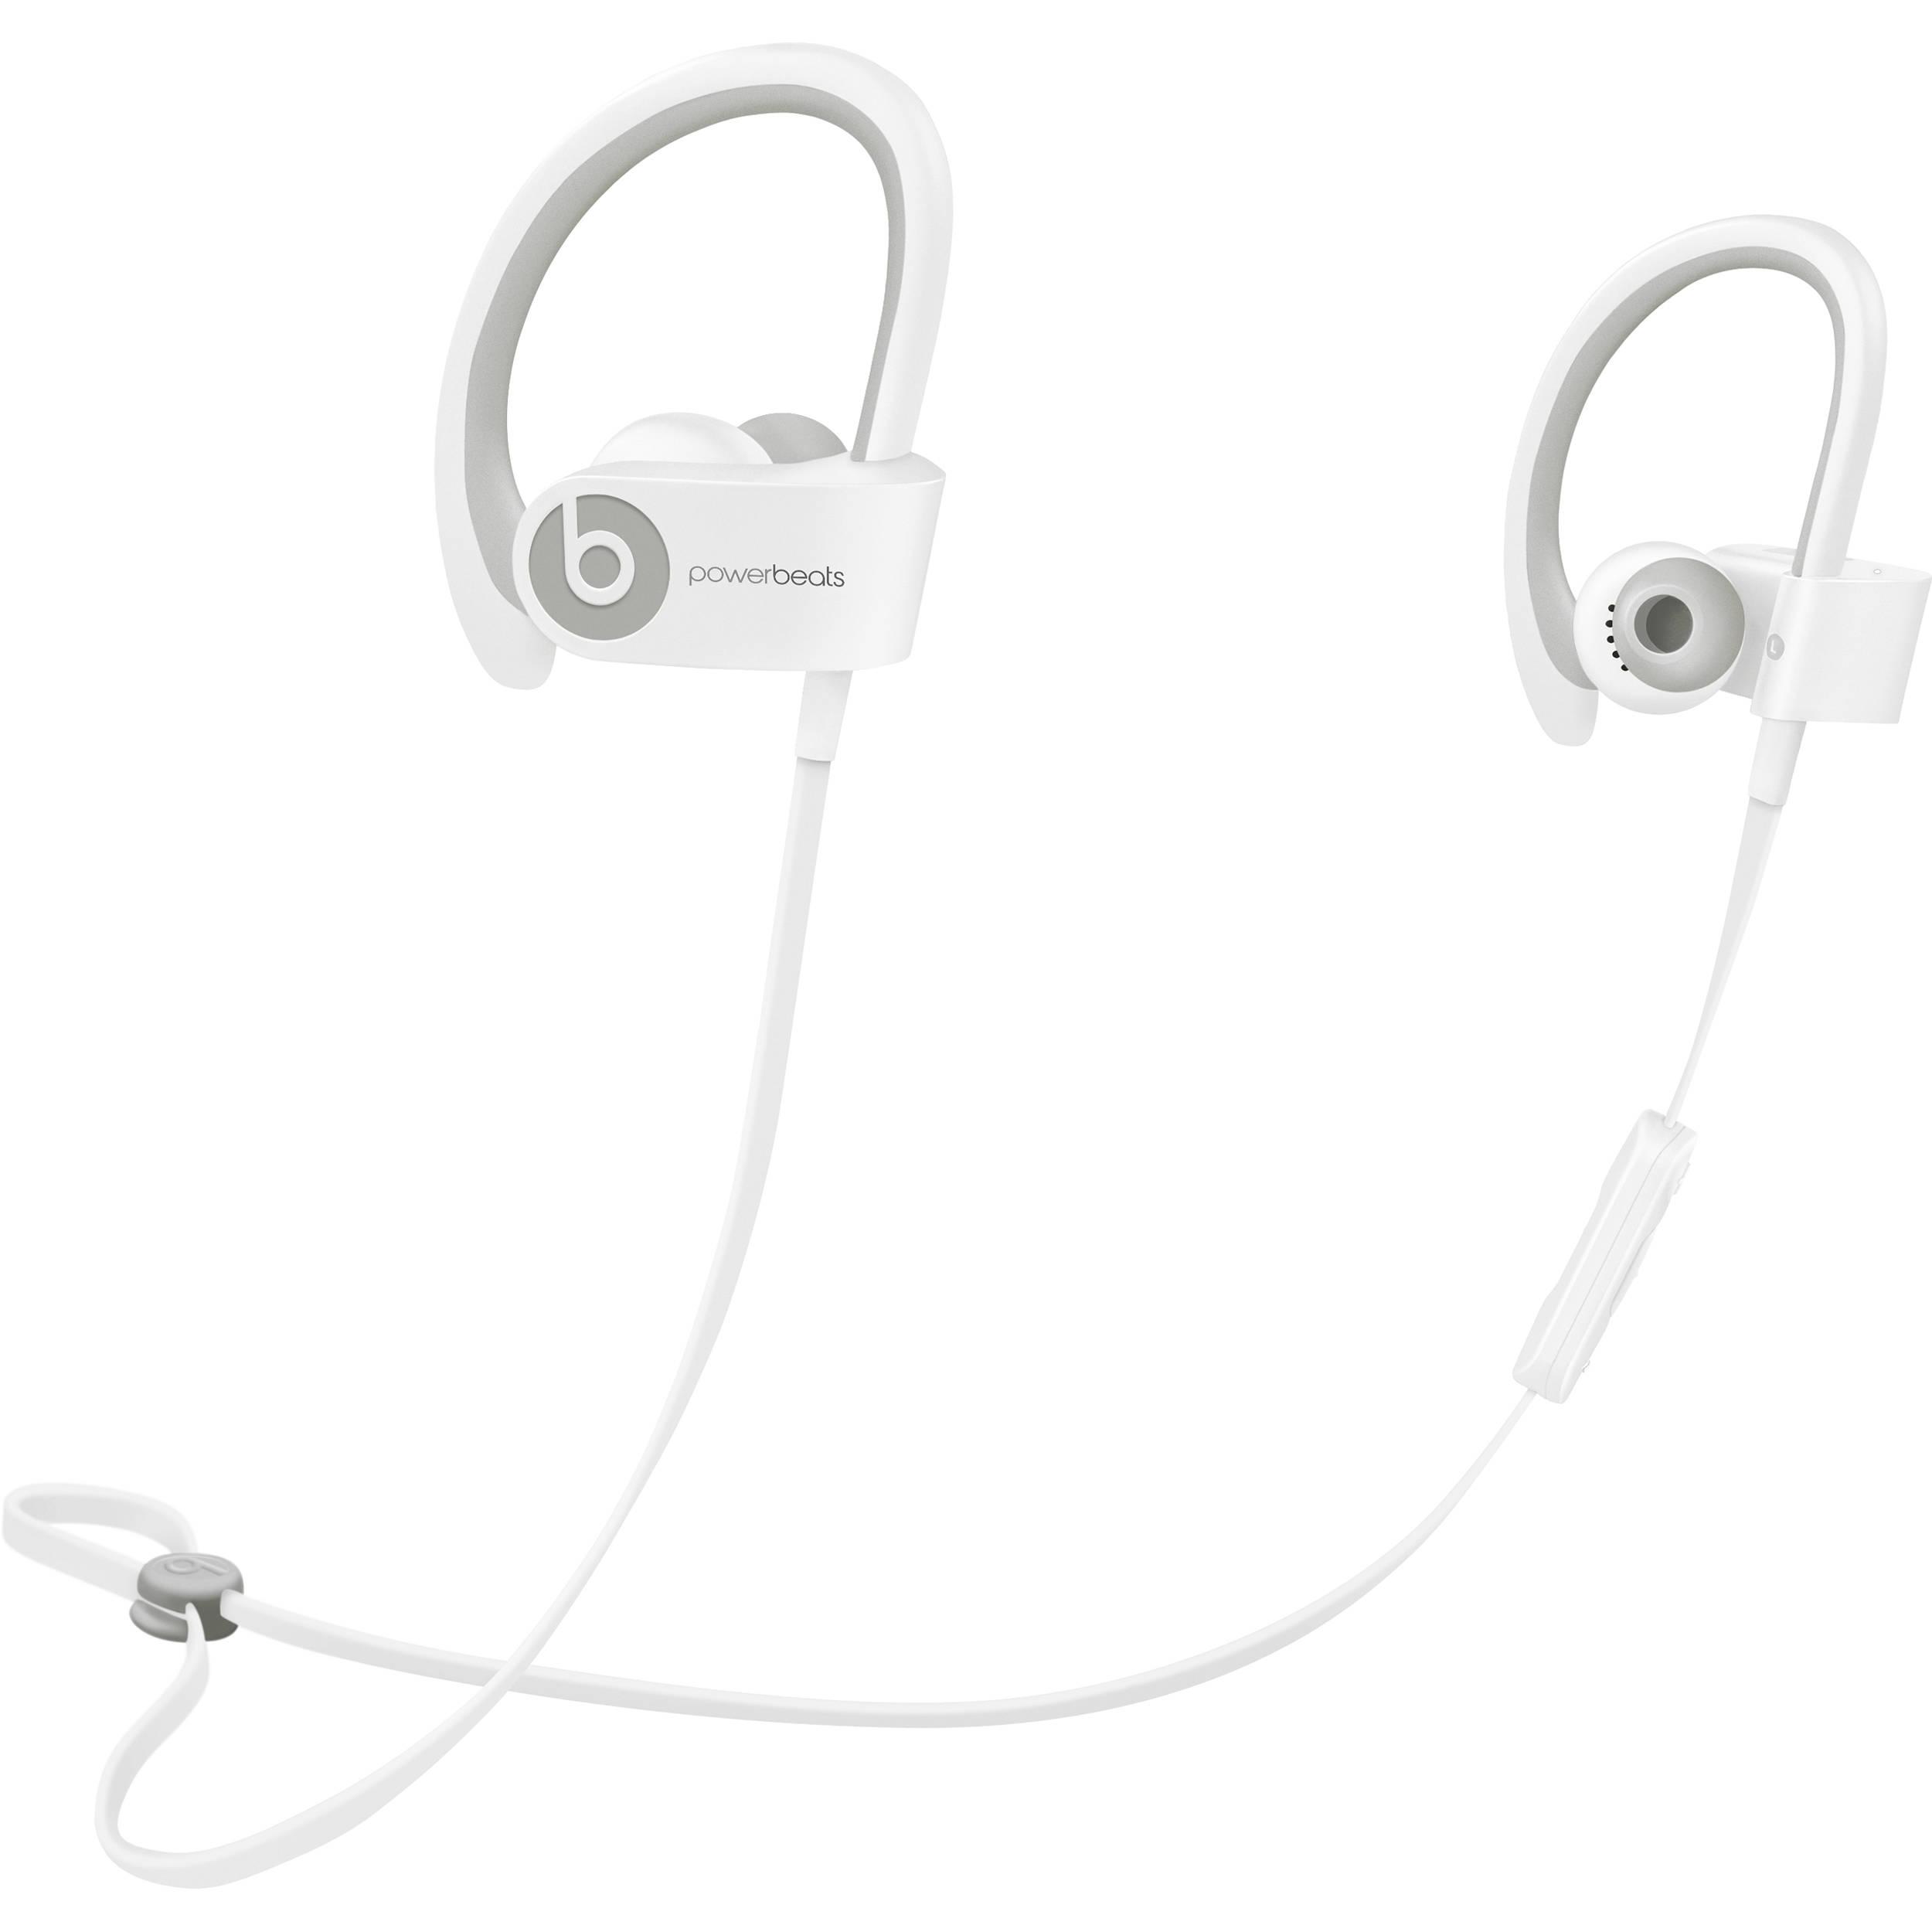 Earbuds beats gold - headphone beats white